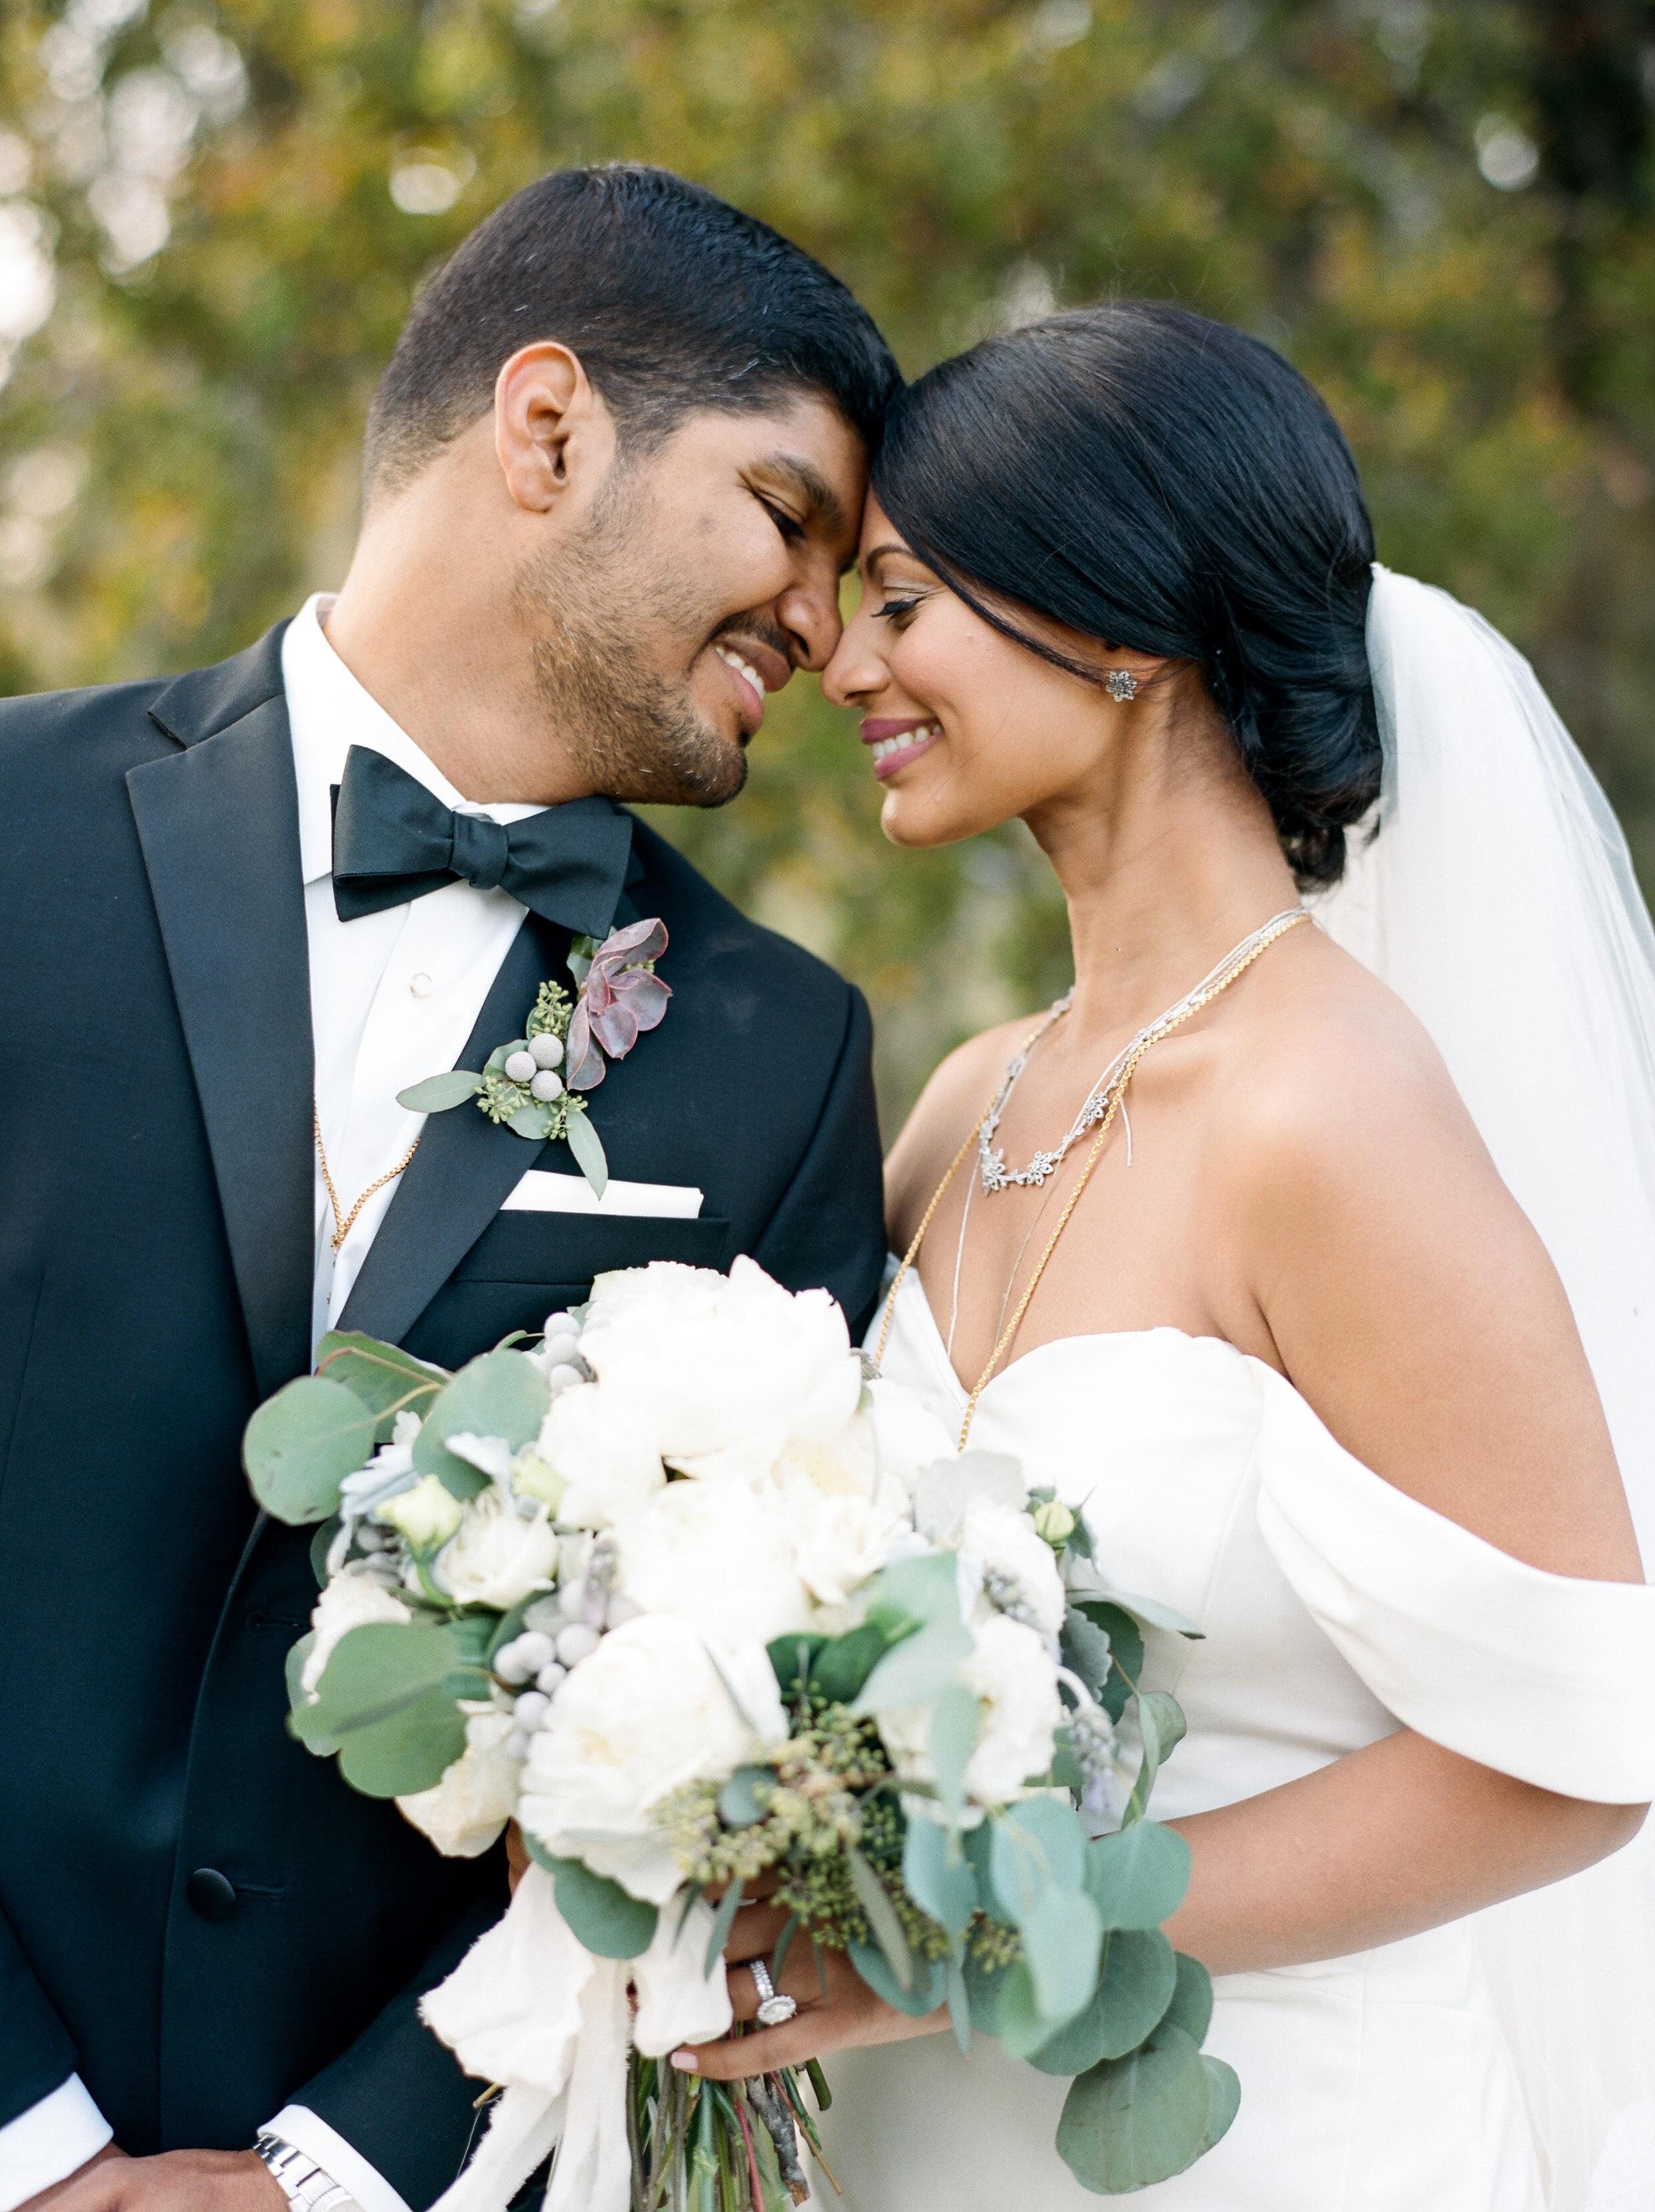 Fine-Art-Film-Houston-Wedding-Photographer-Best-Top-Luxury-Texas-Austin-Dallas-Destination-Dana-Fernandez-Photography-The-Bell-Tower-on-34th-Indian-28.jpg